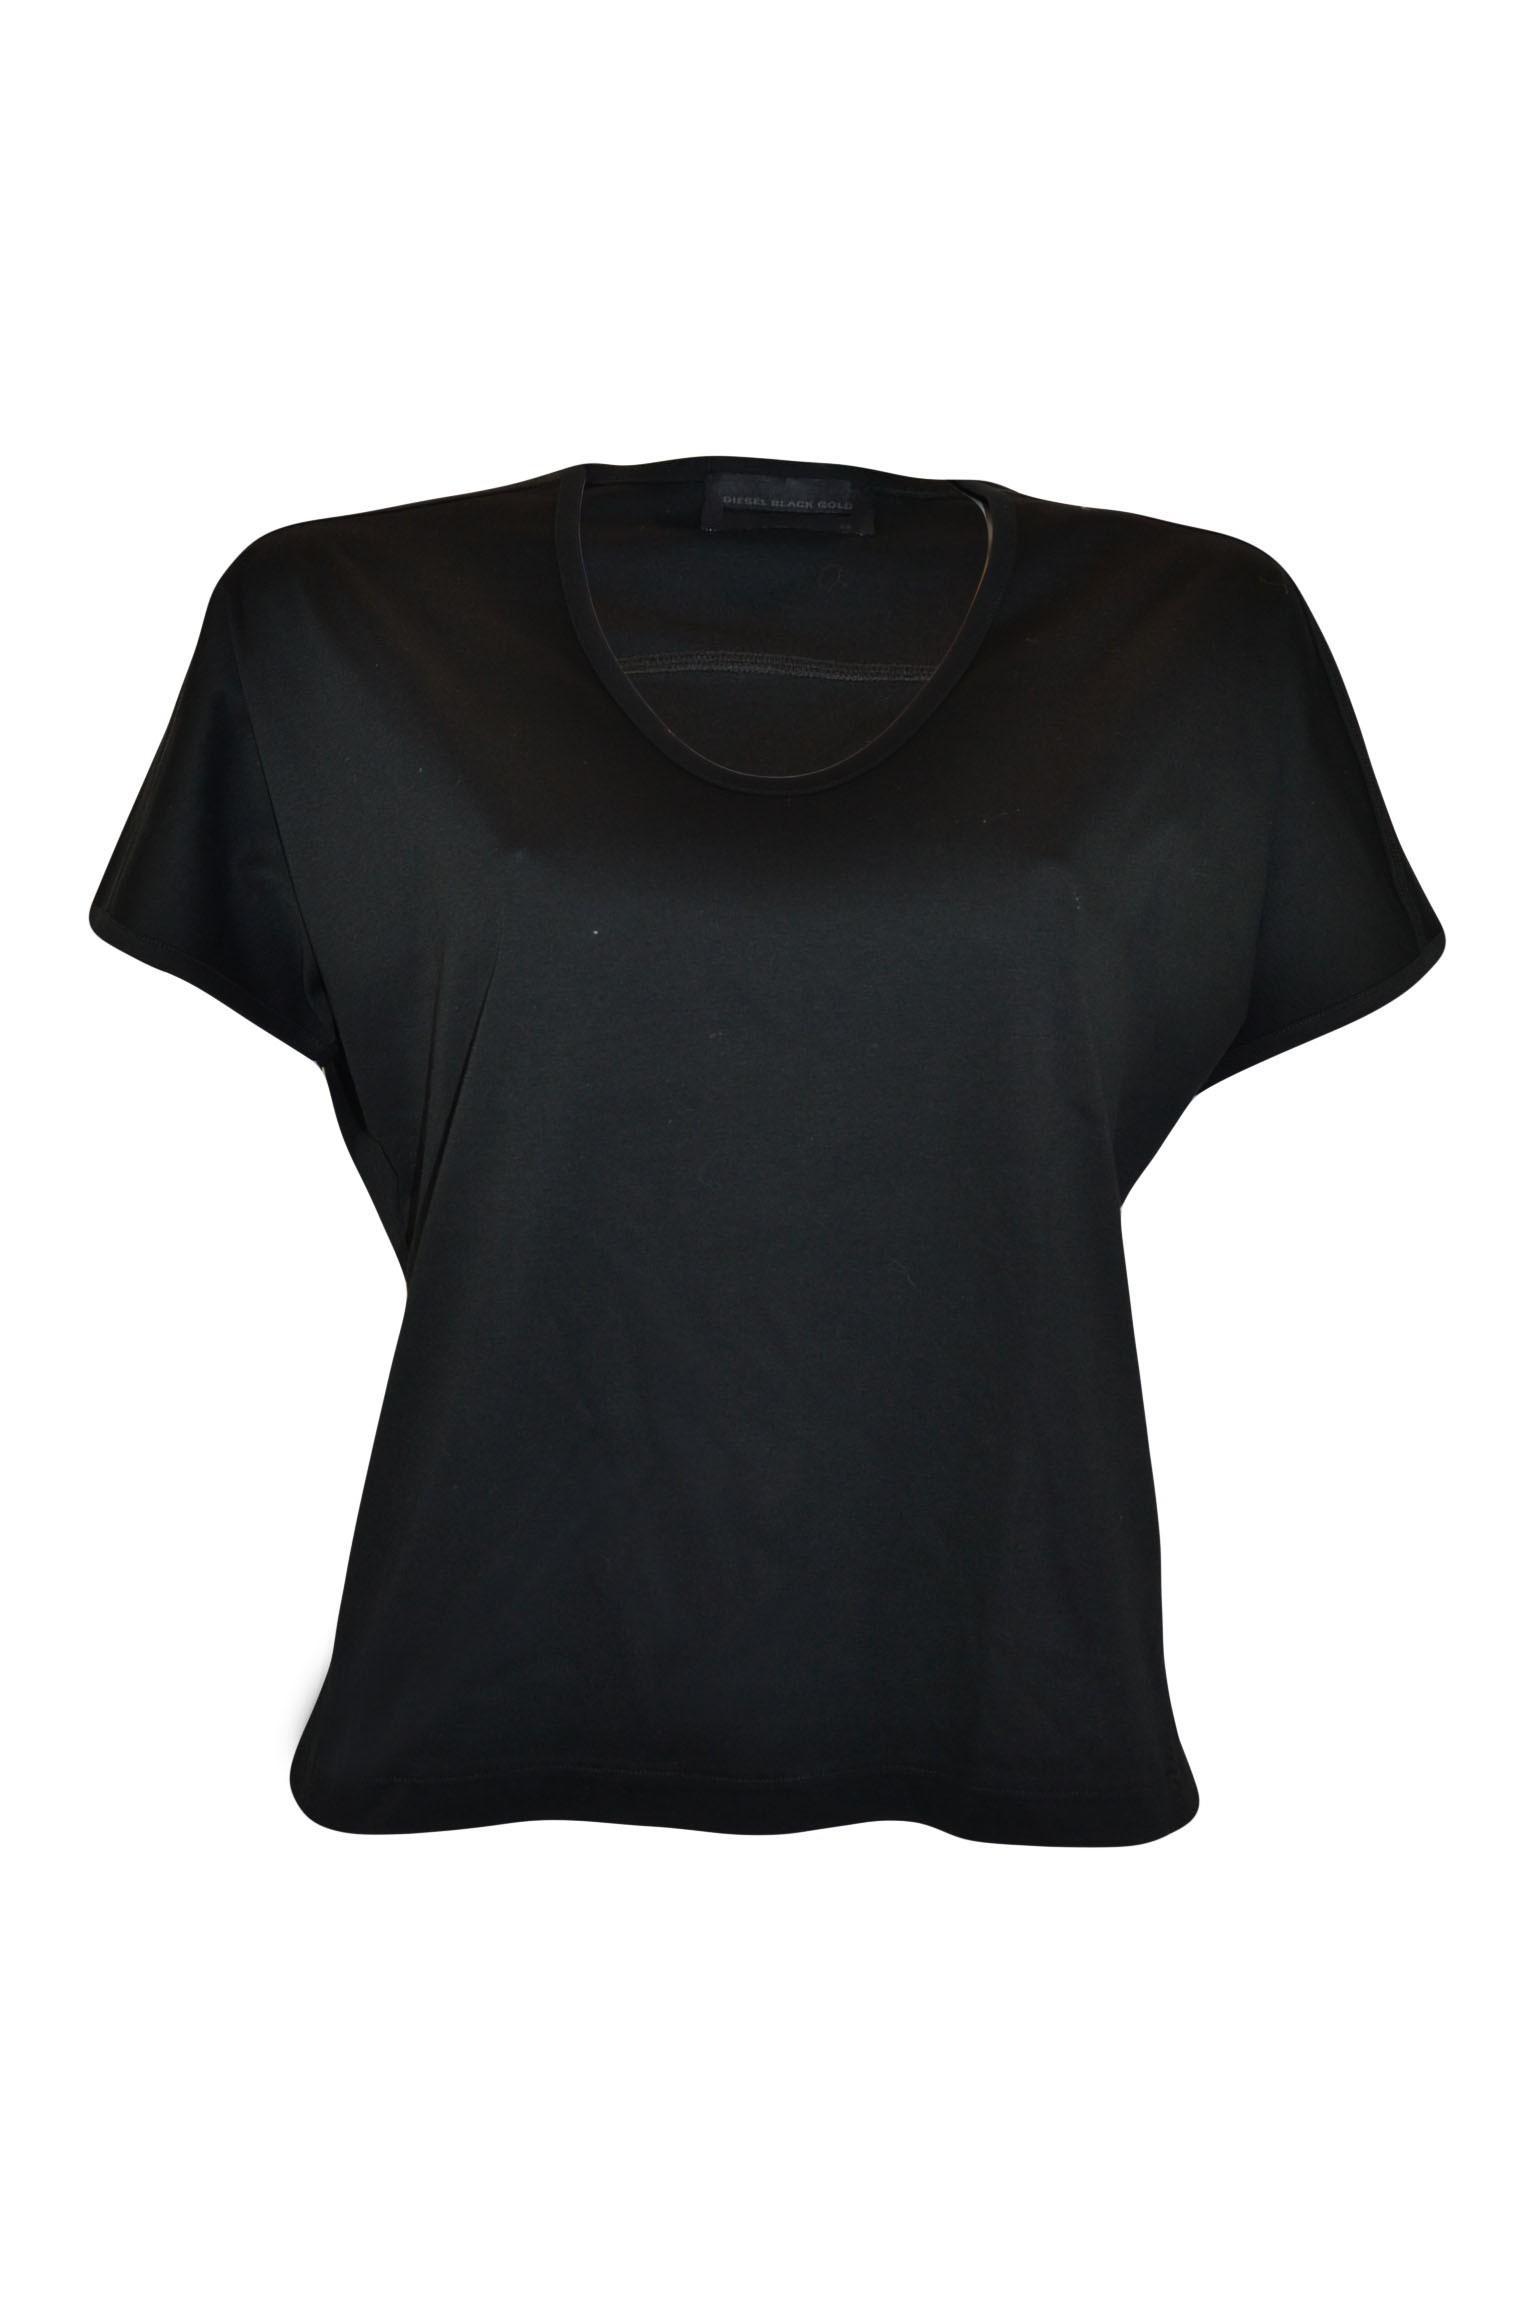 Diesel black gold tshirt bgcmp